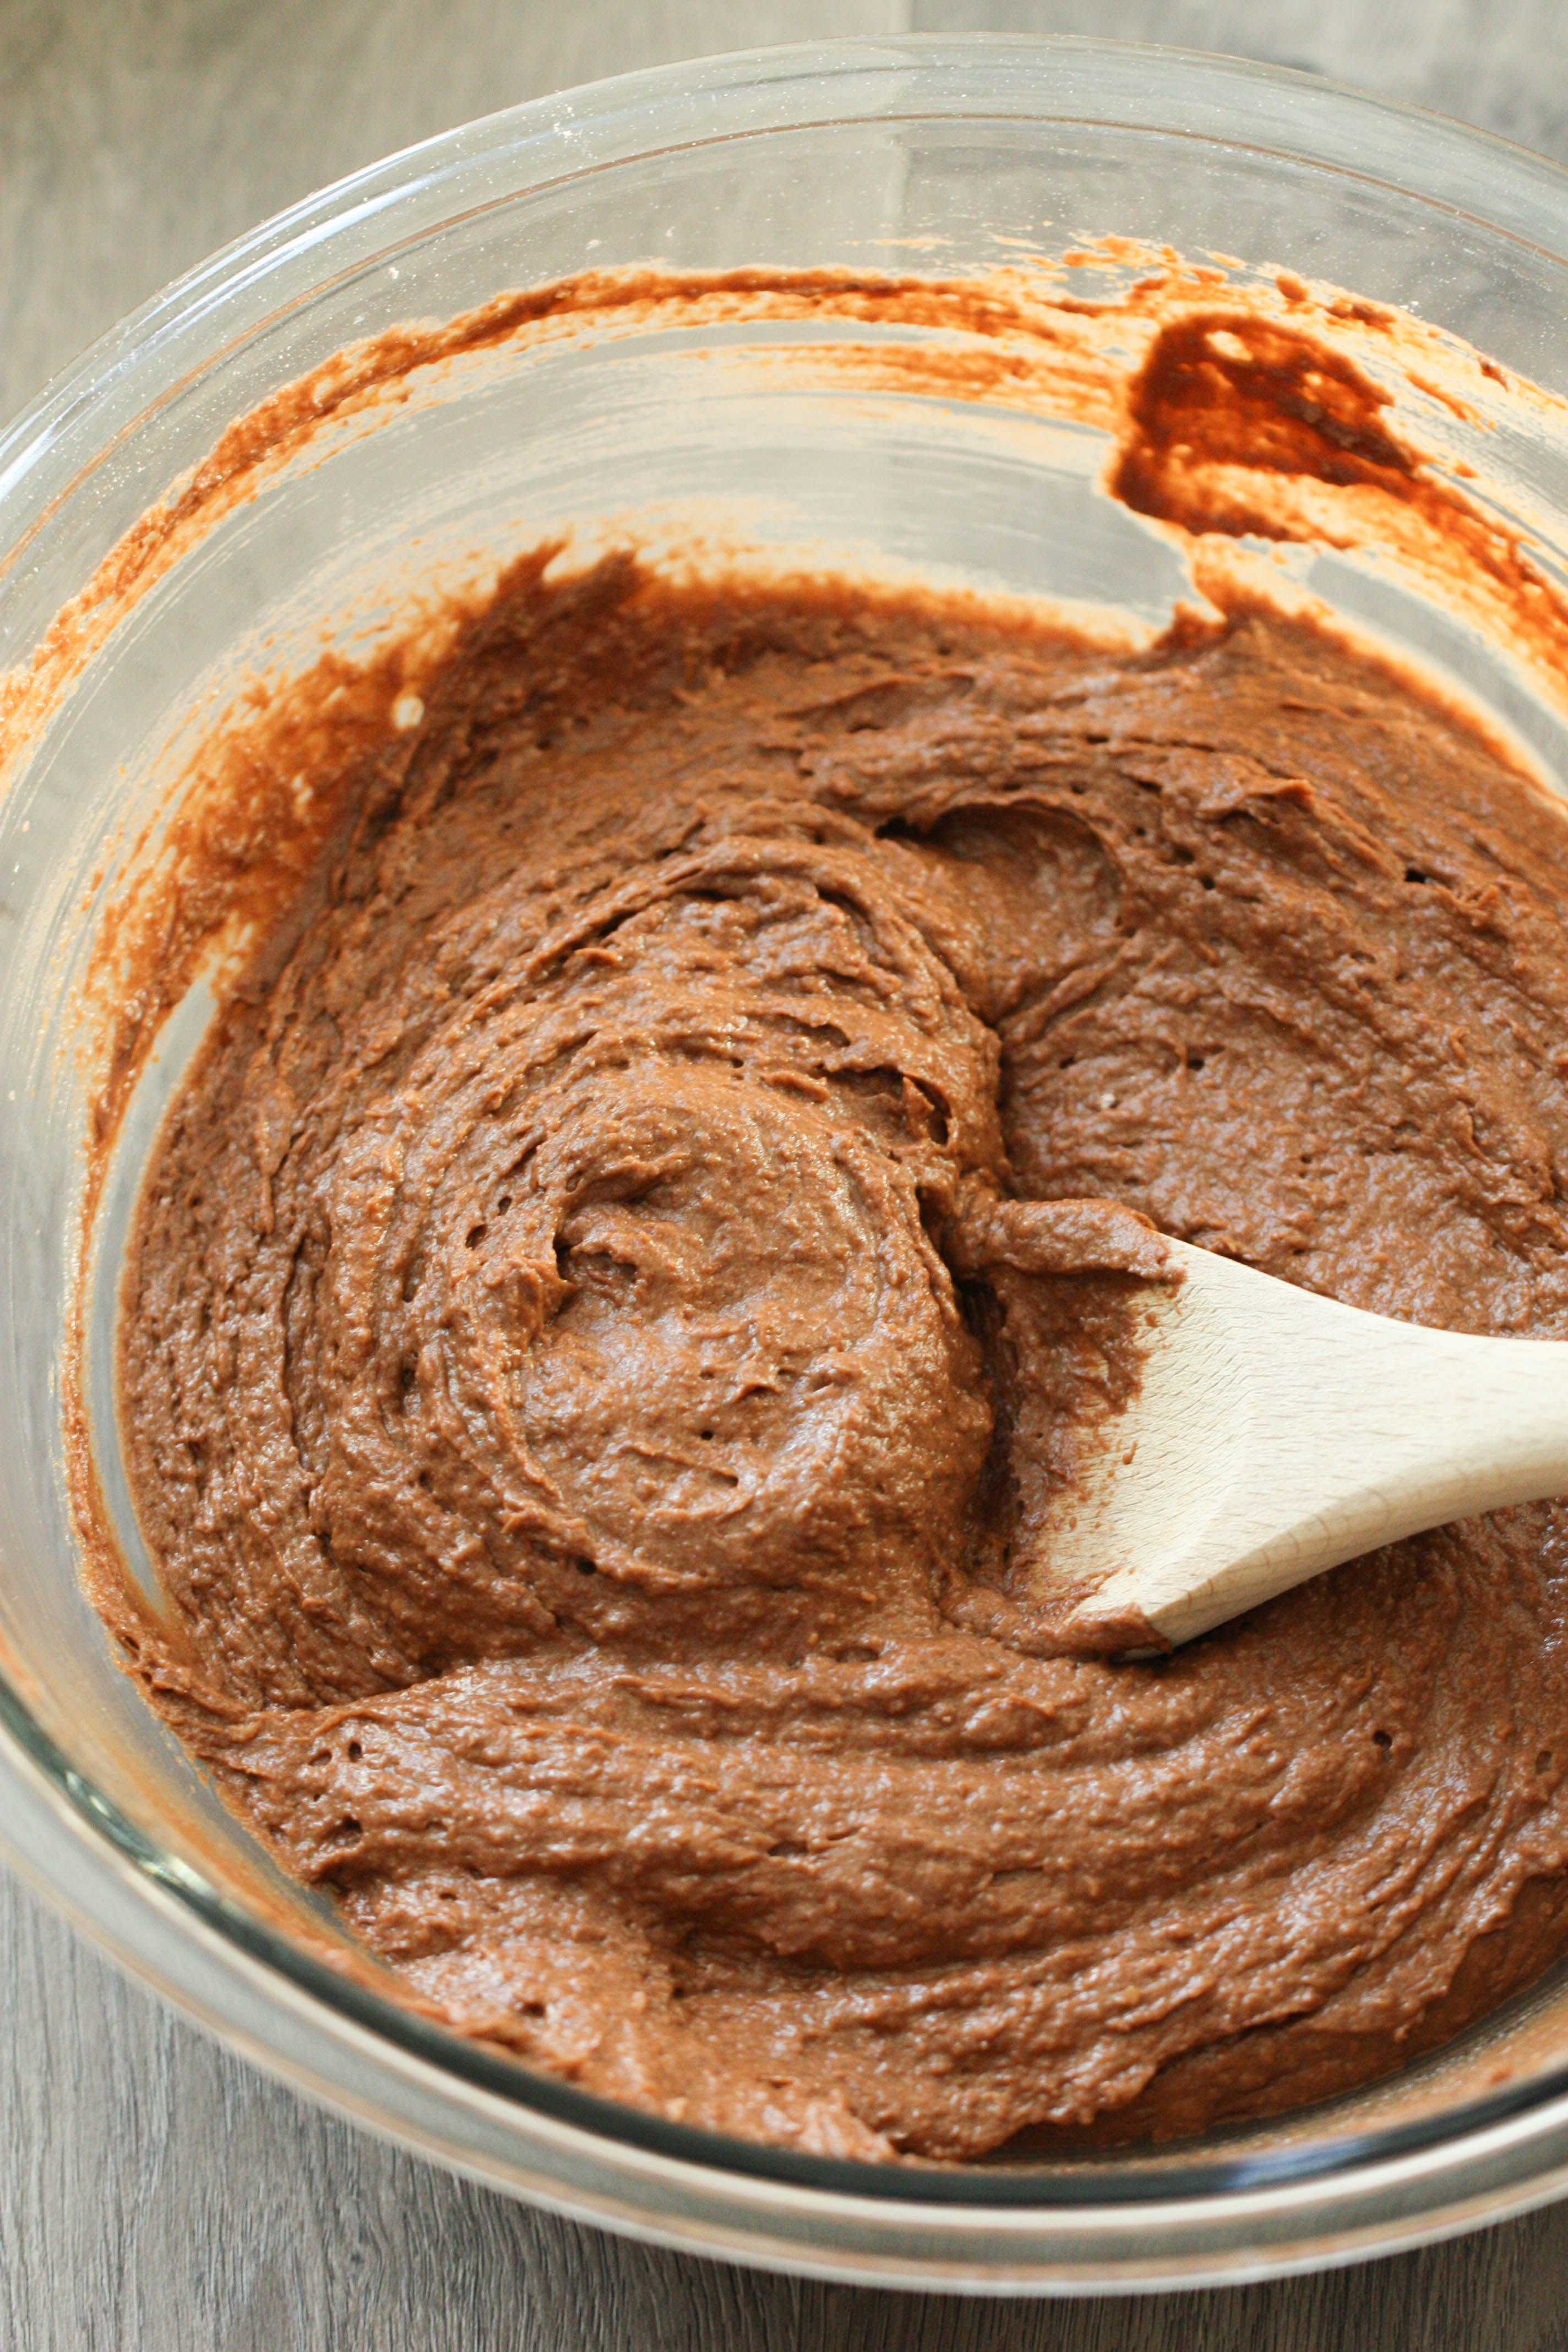 Chocolate Pumpkin Muffin batter in a glass bowl